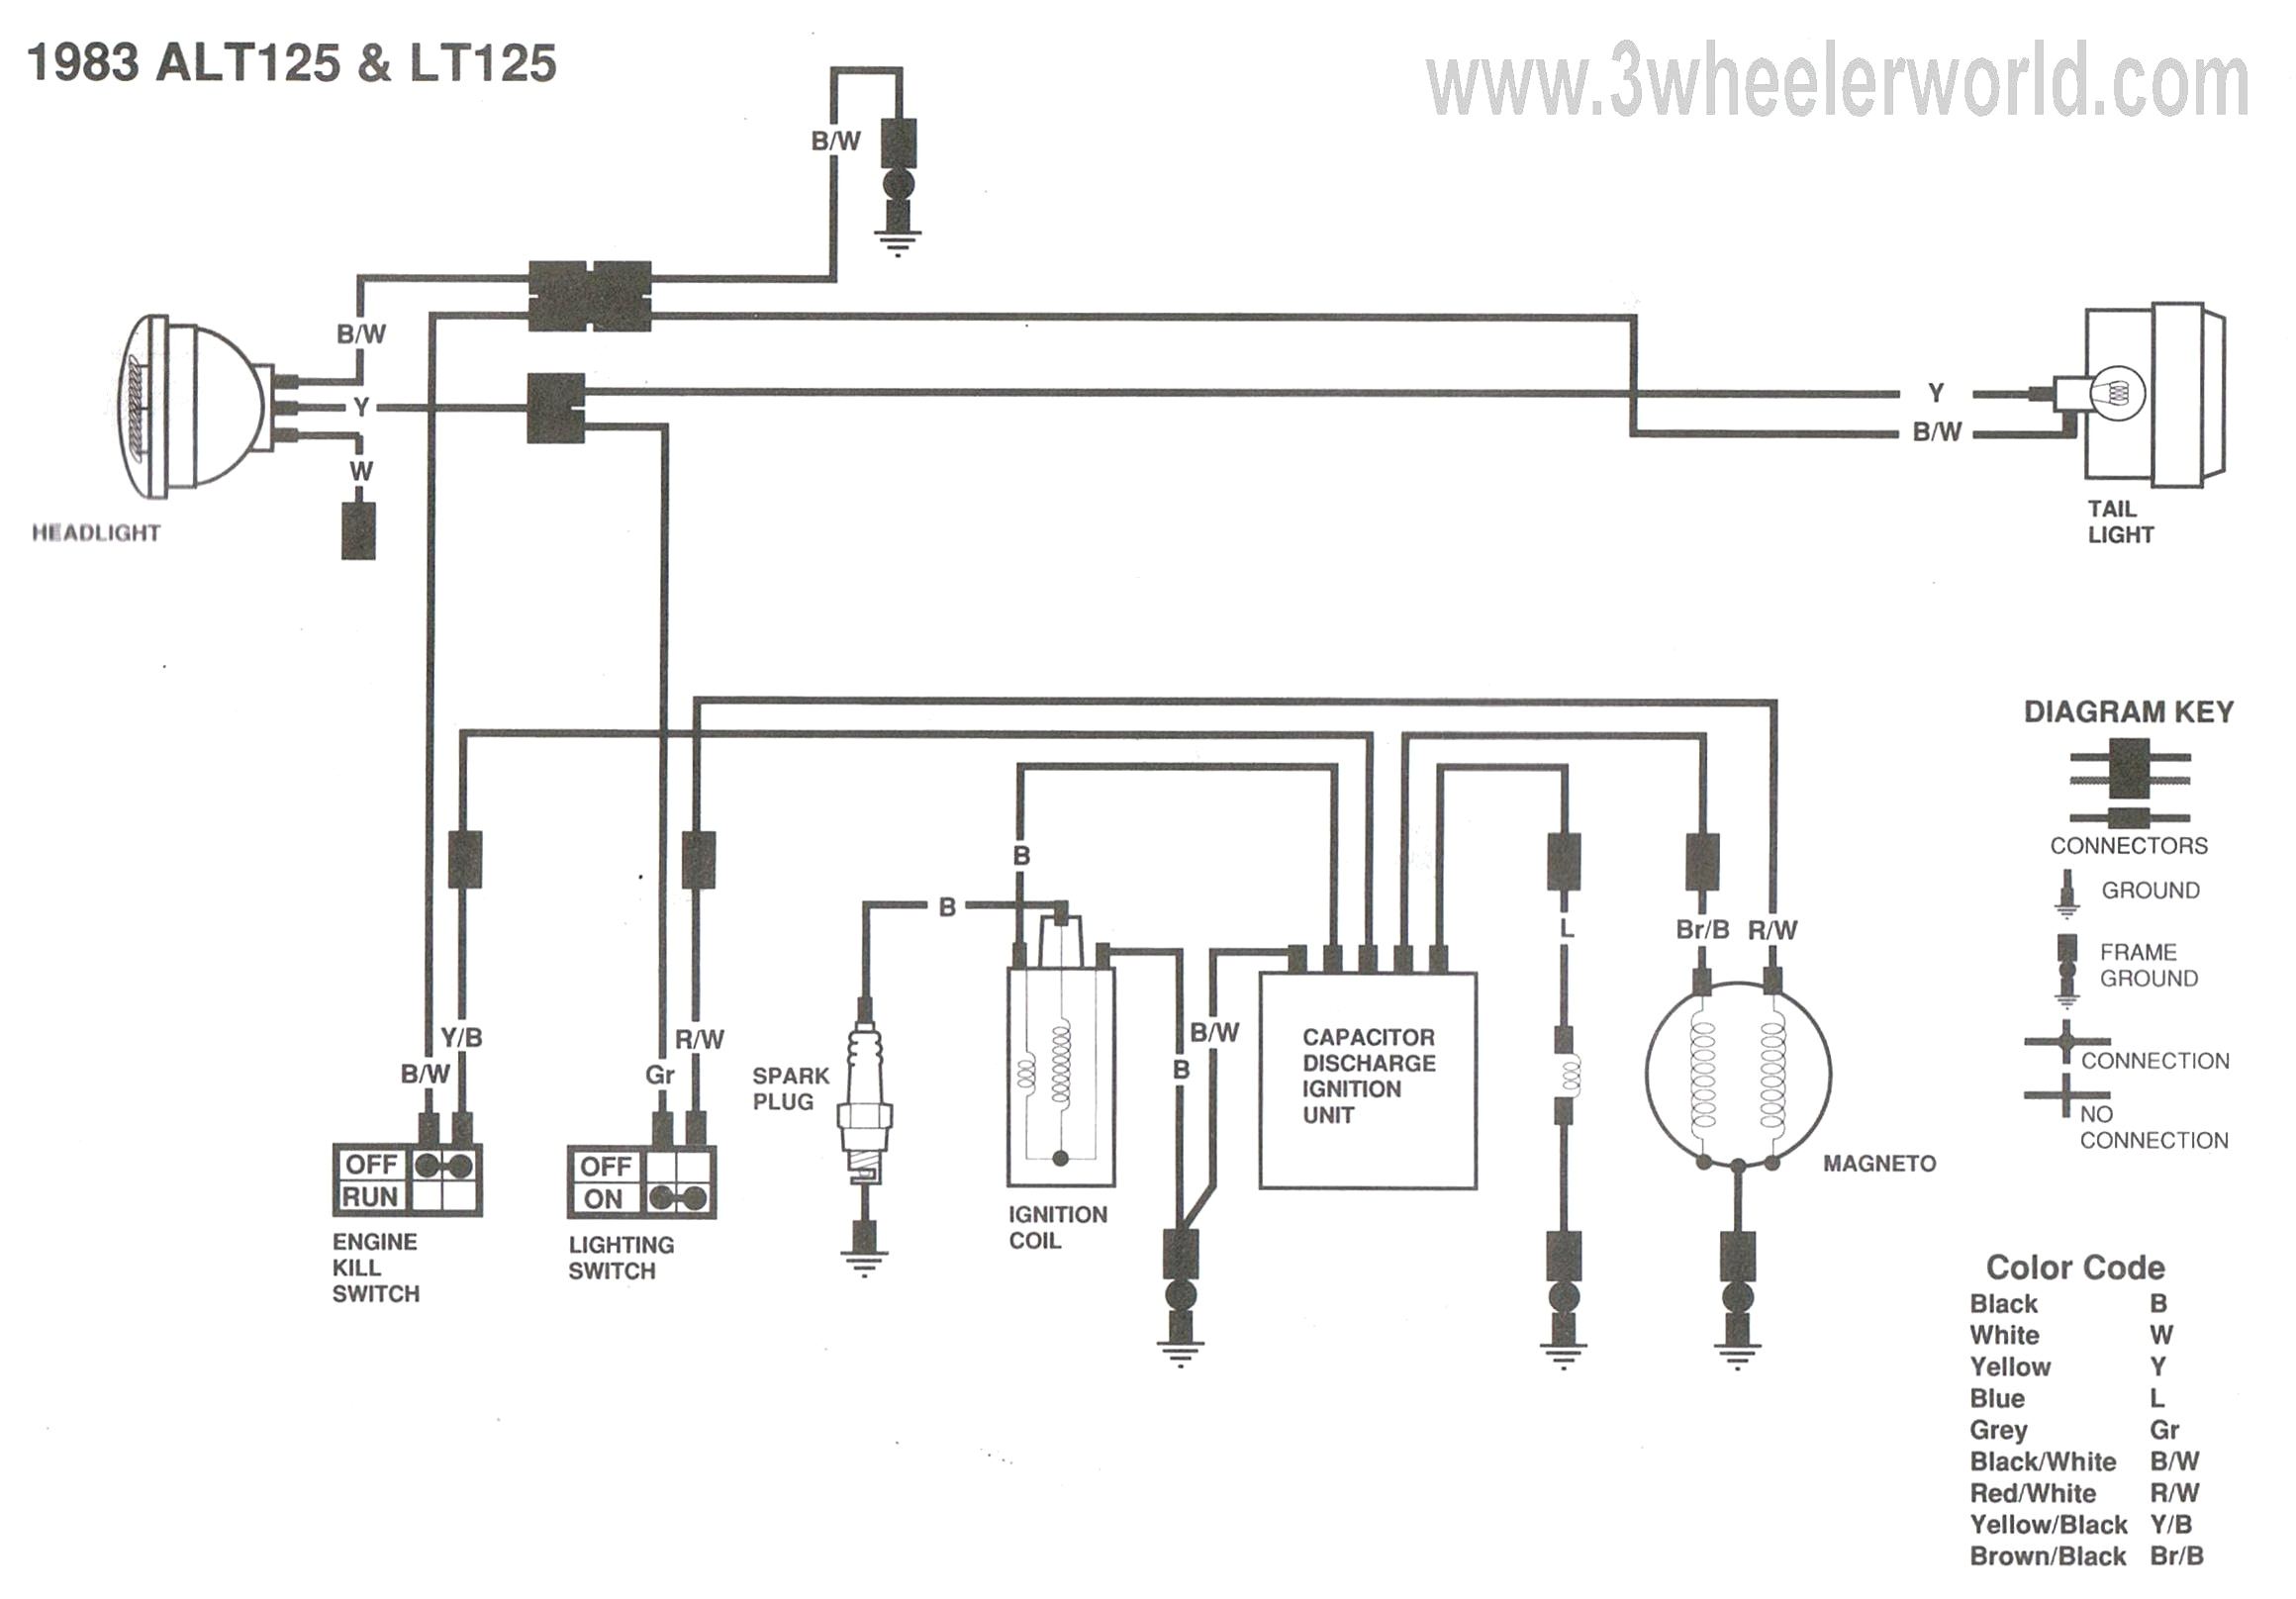 kawasaki 610 wiring schematic wiring diagram sys2008 mule 610 engine diagram wiring diagram expert kawasaki 610